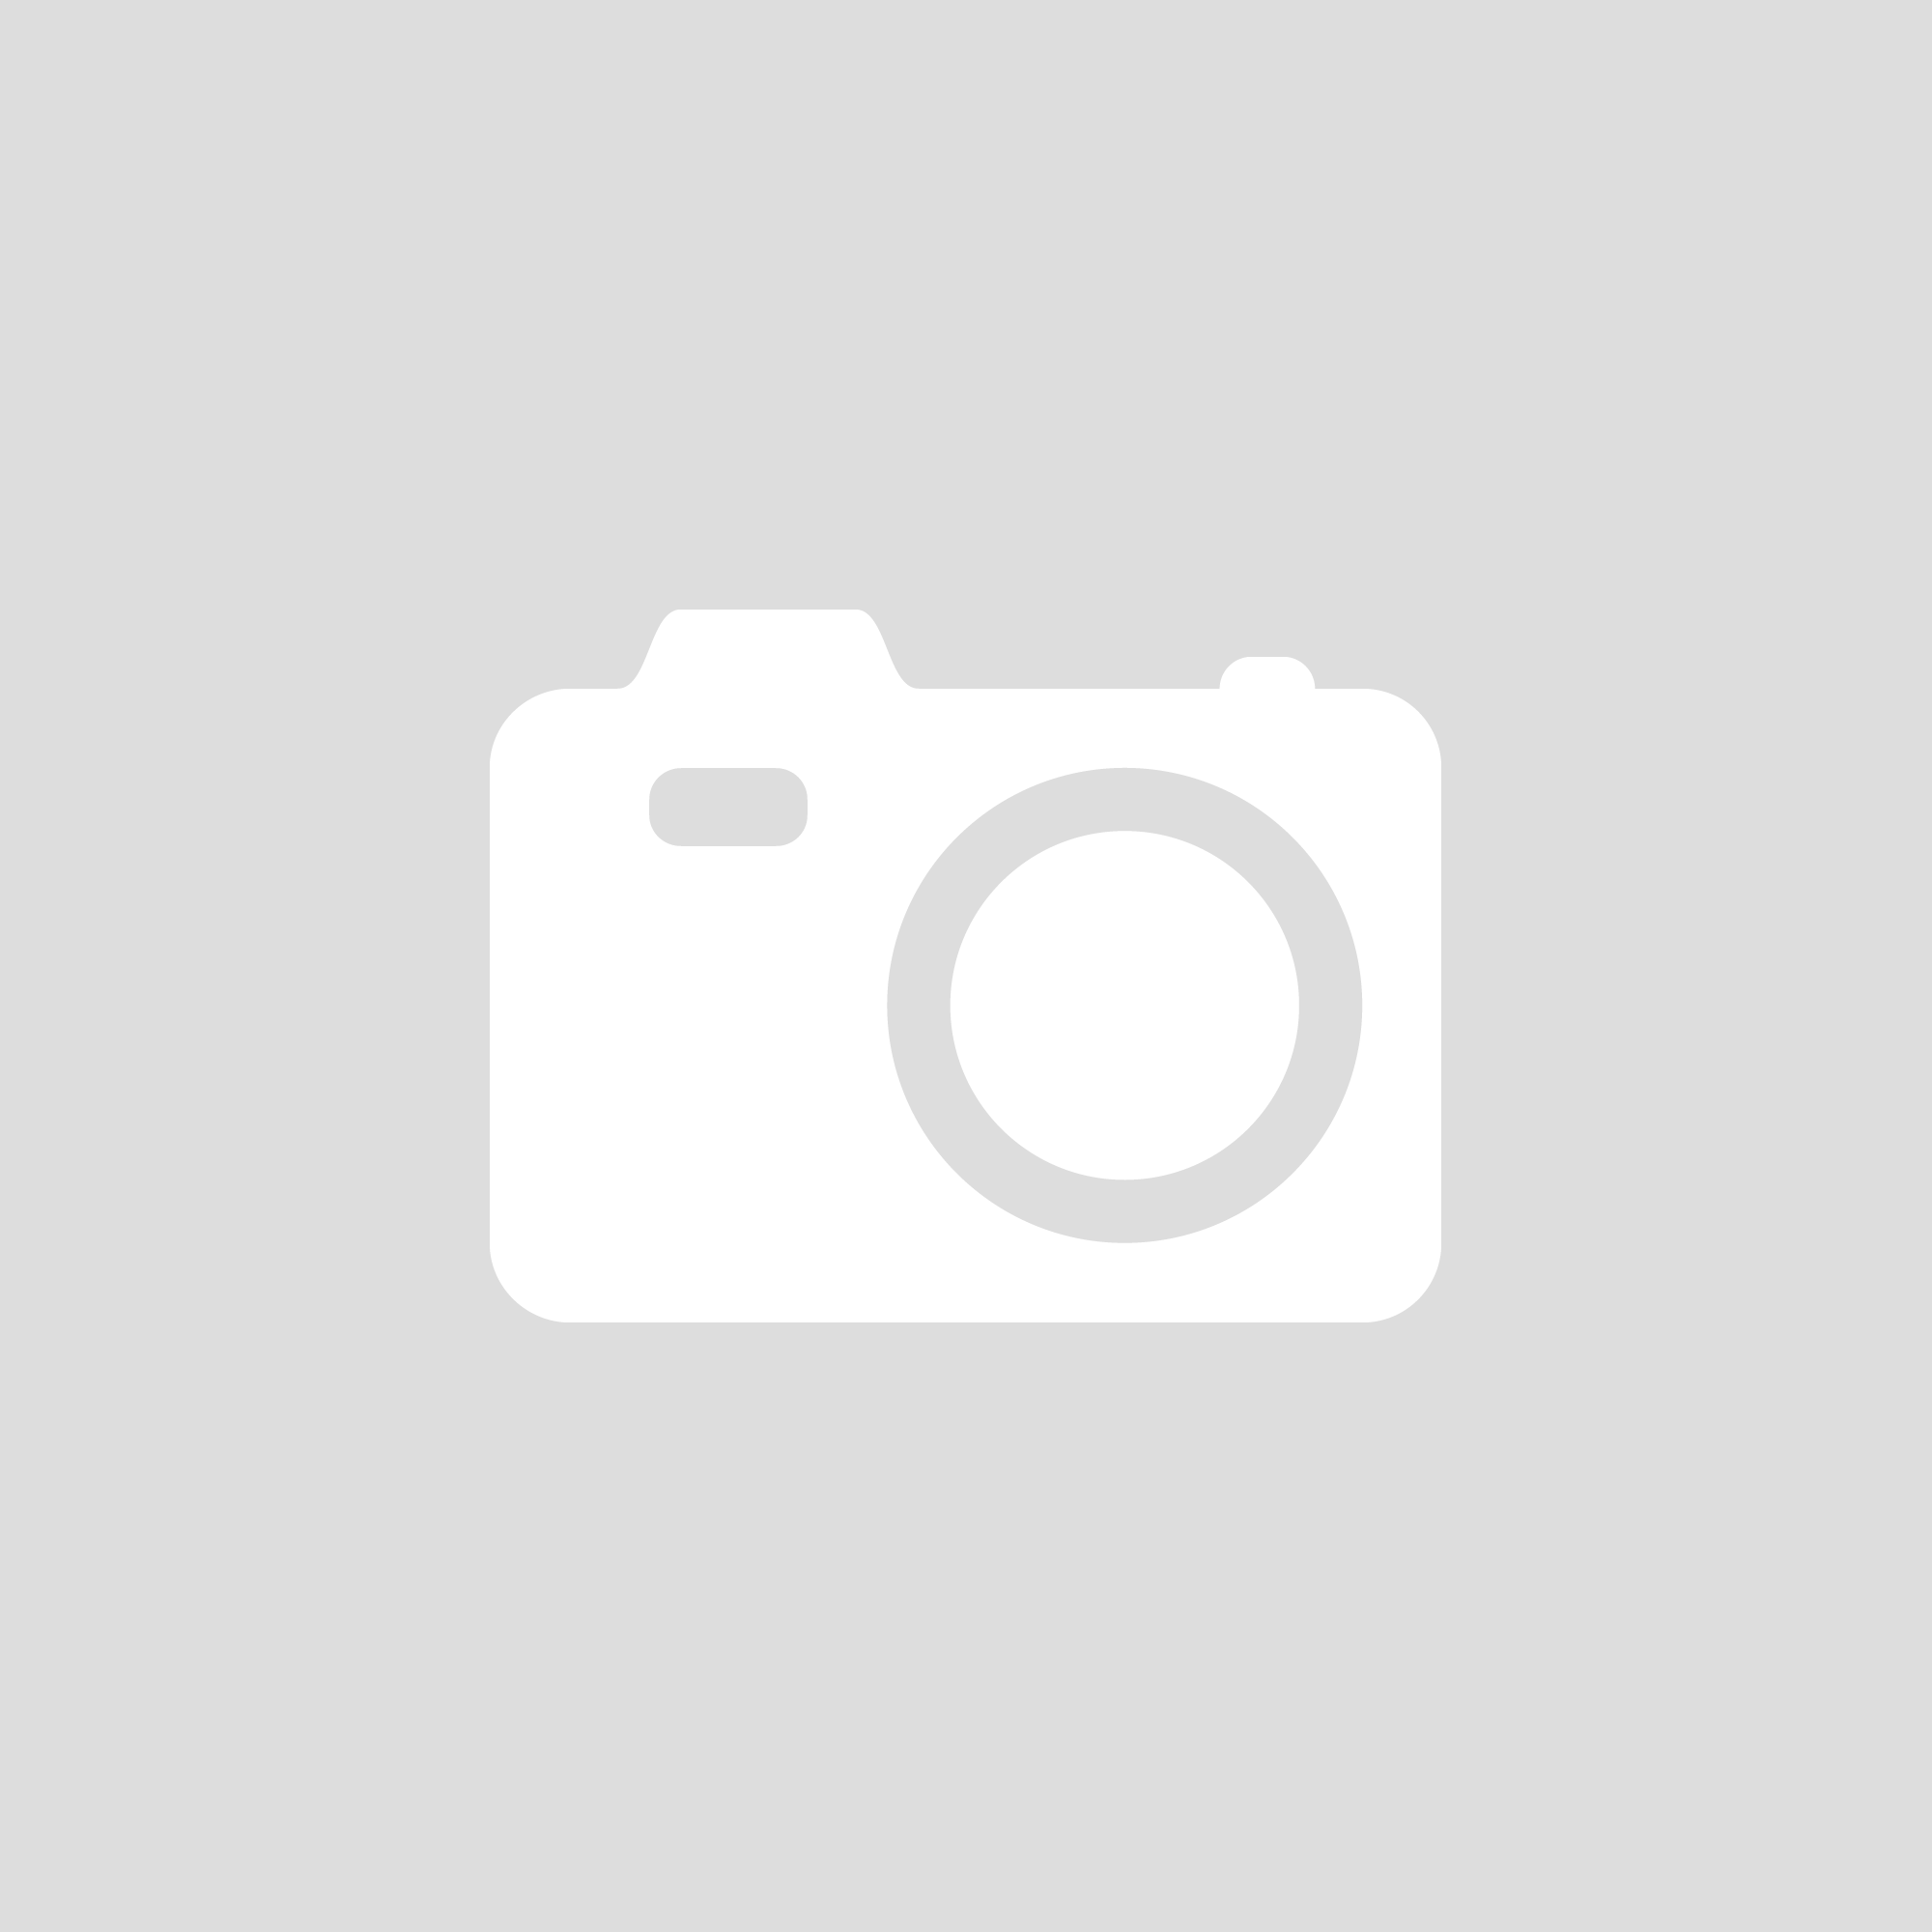 Royal Palm Cream / Silver Wallpaper by Moda Black Label 57004